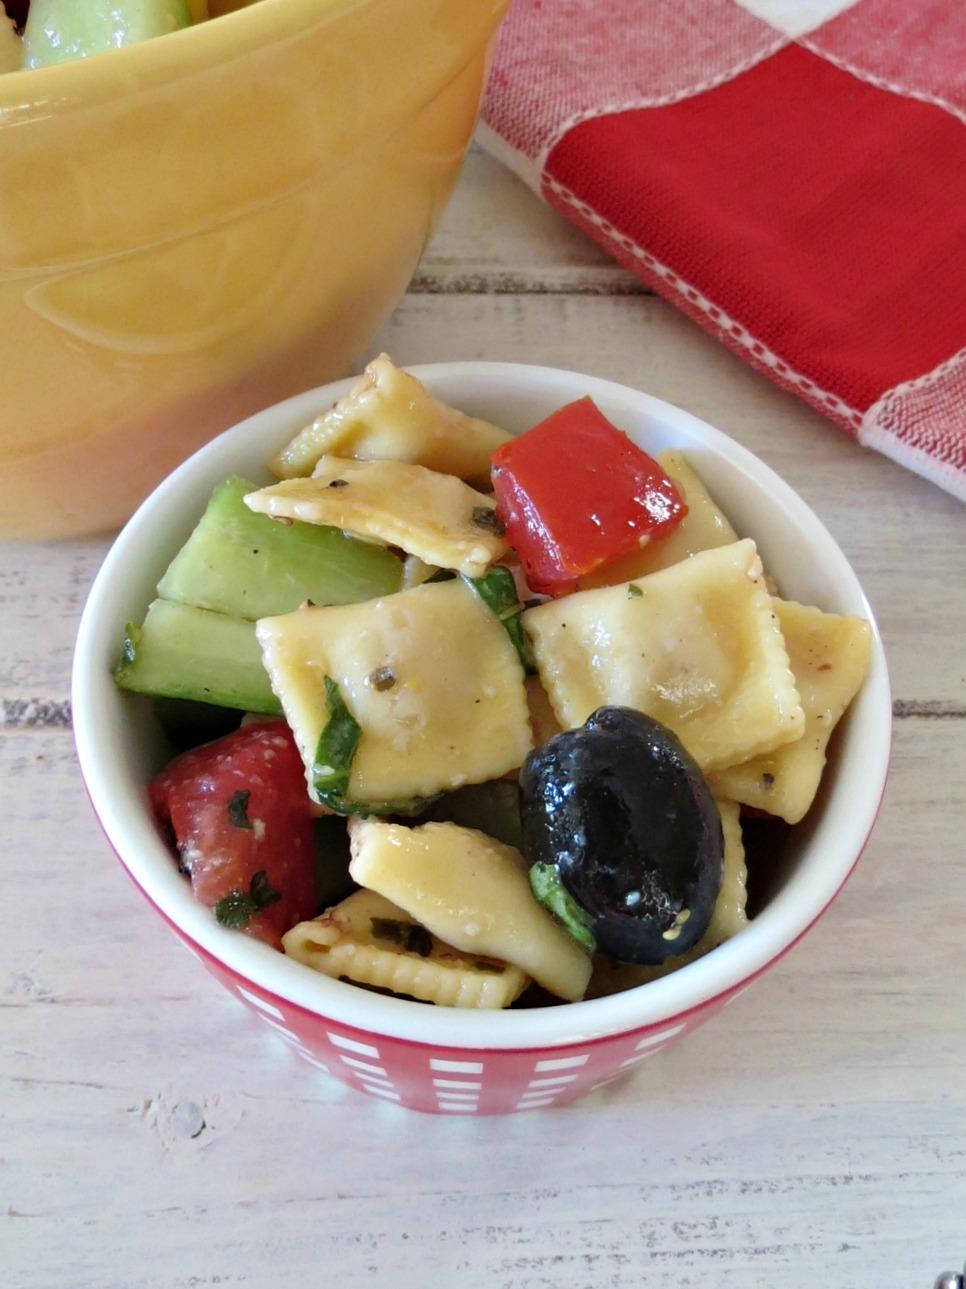 Meditteranean Pasta Salad